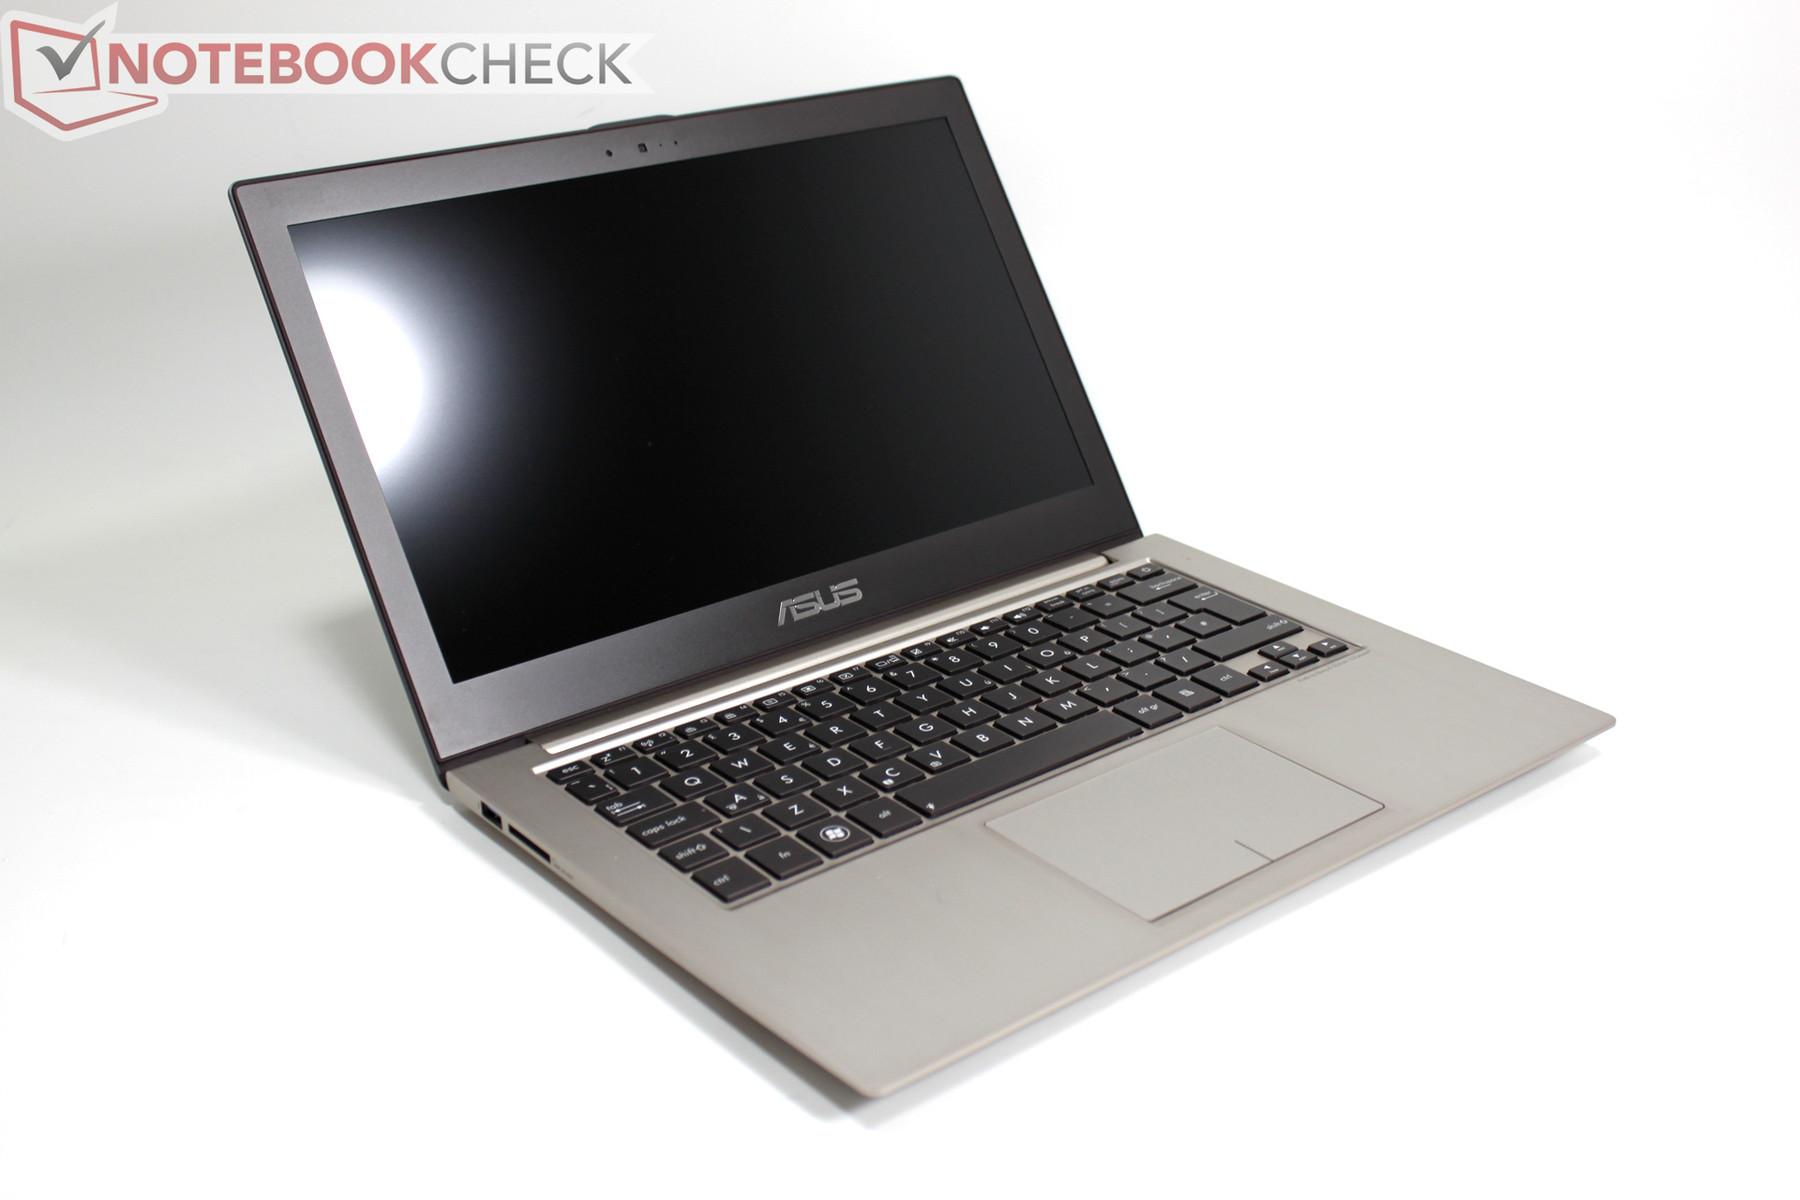 Review Asus Zenbook UX32VD Ultrabook